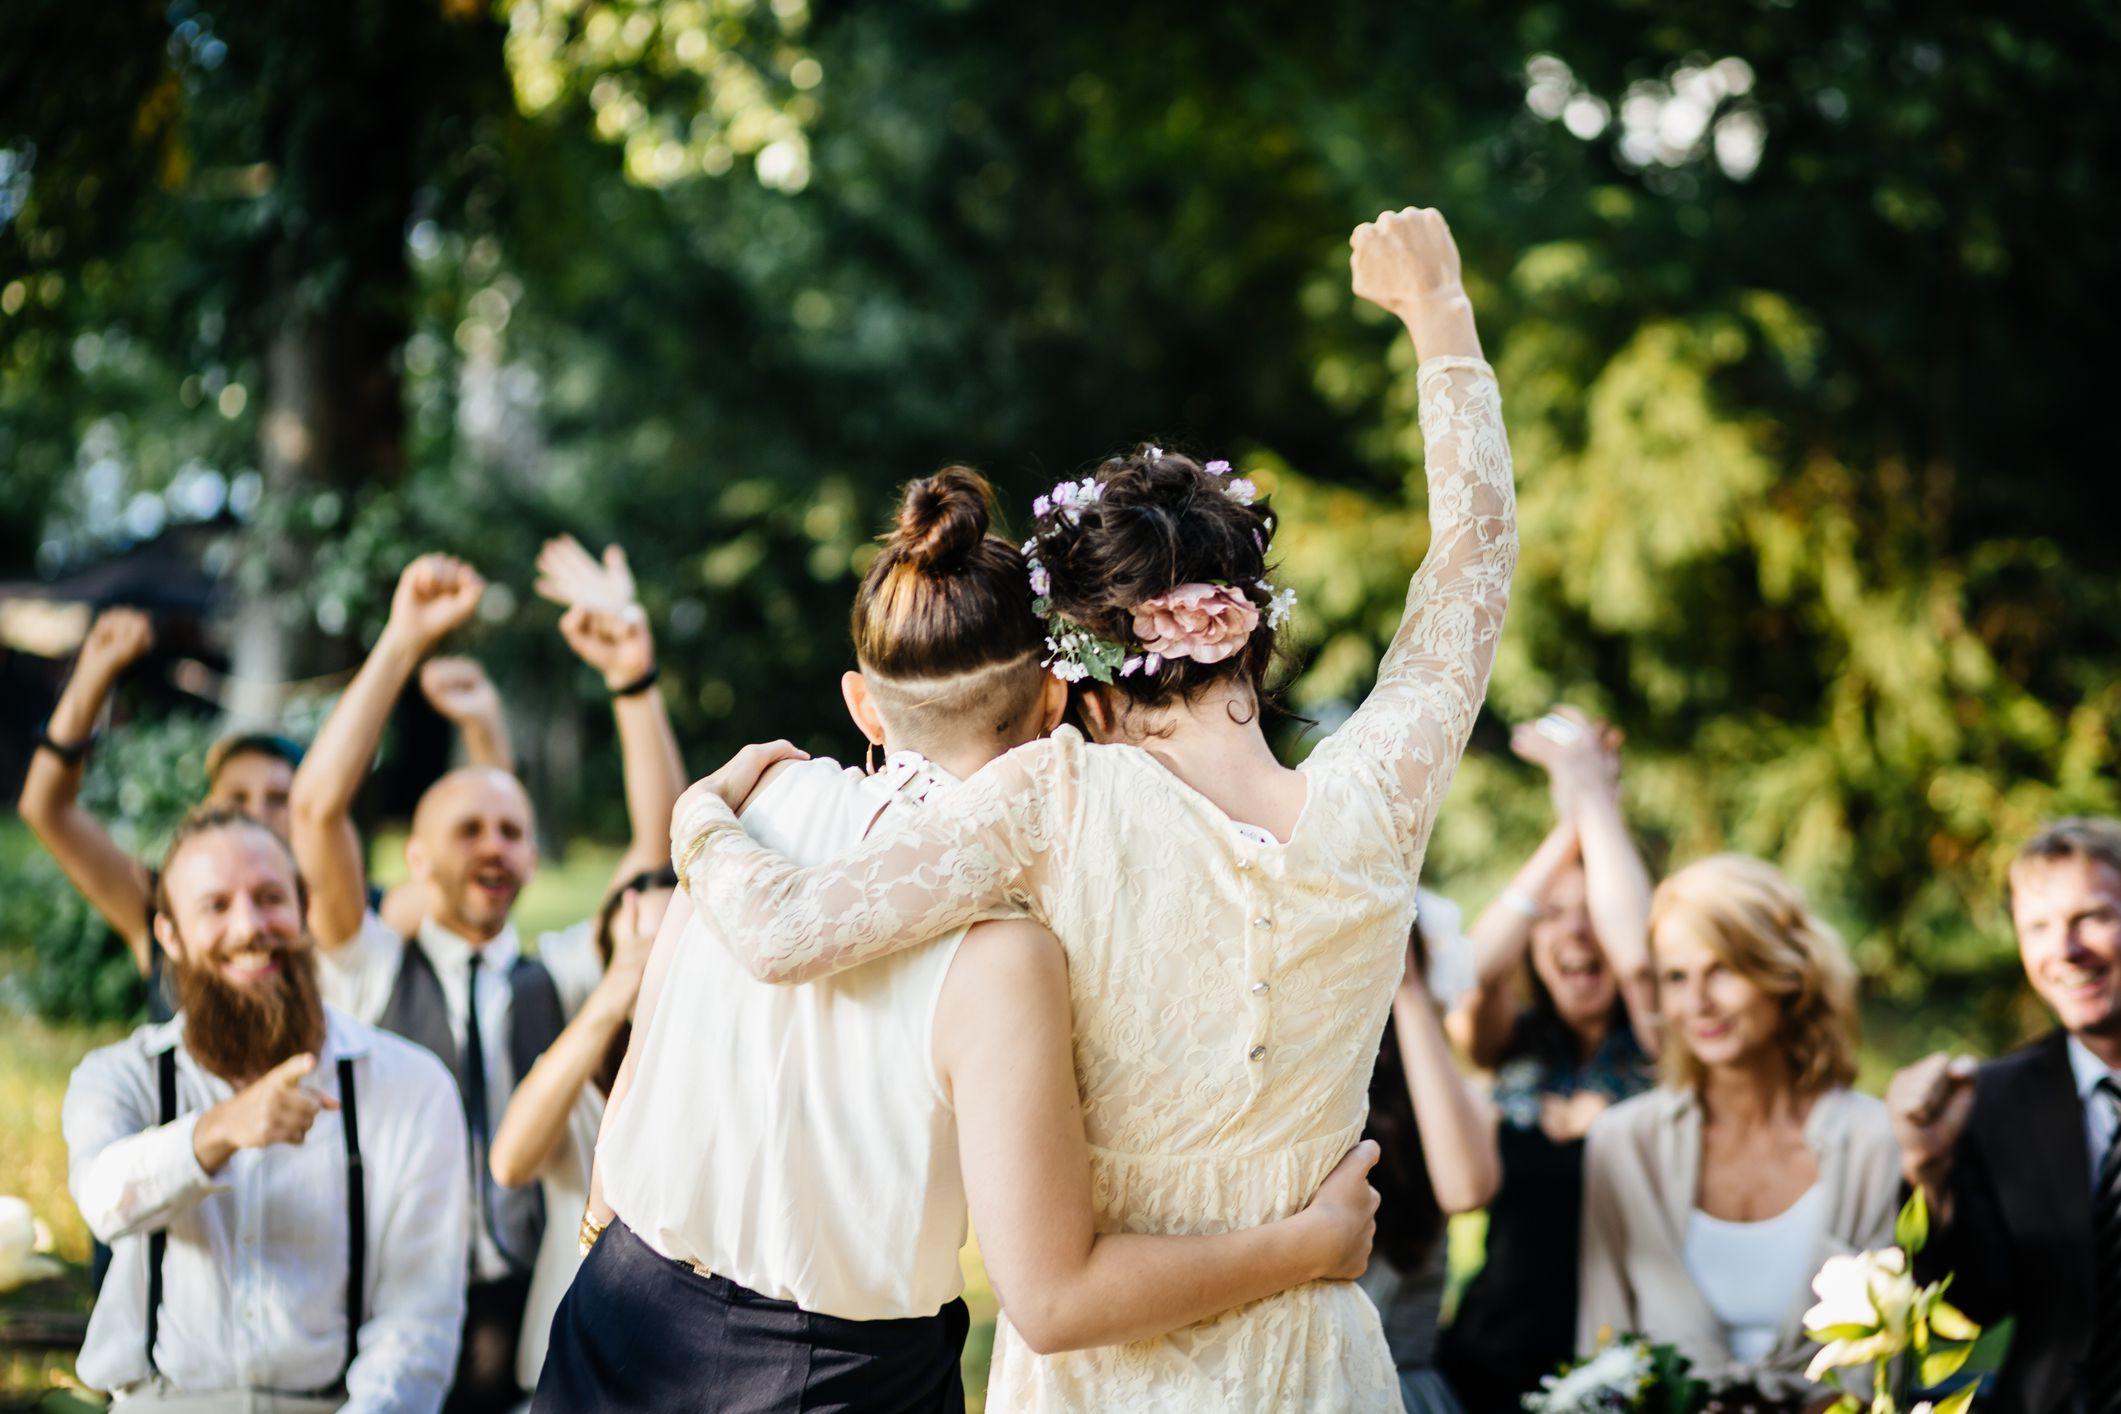 Lesbian wedding photo album